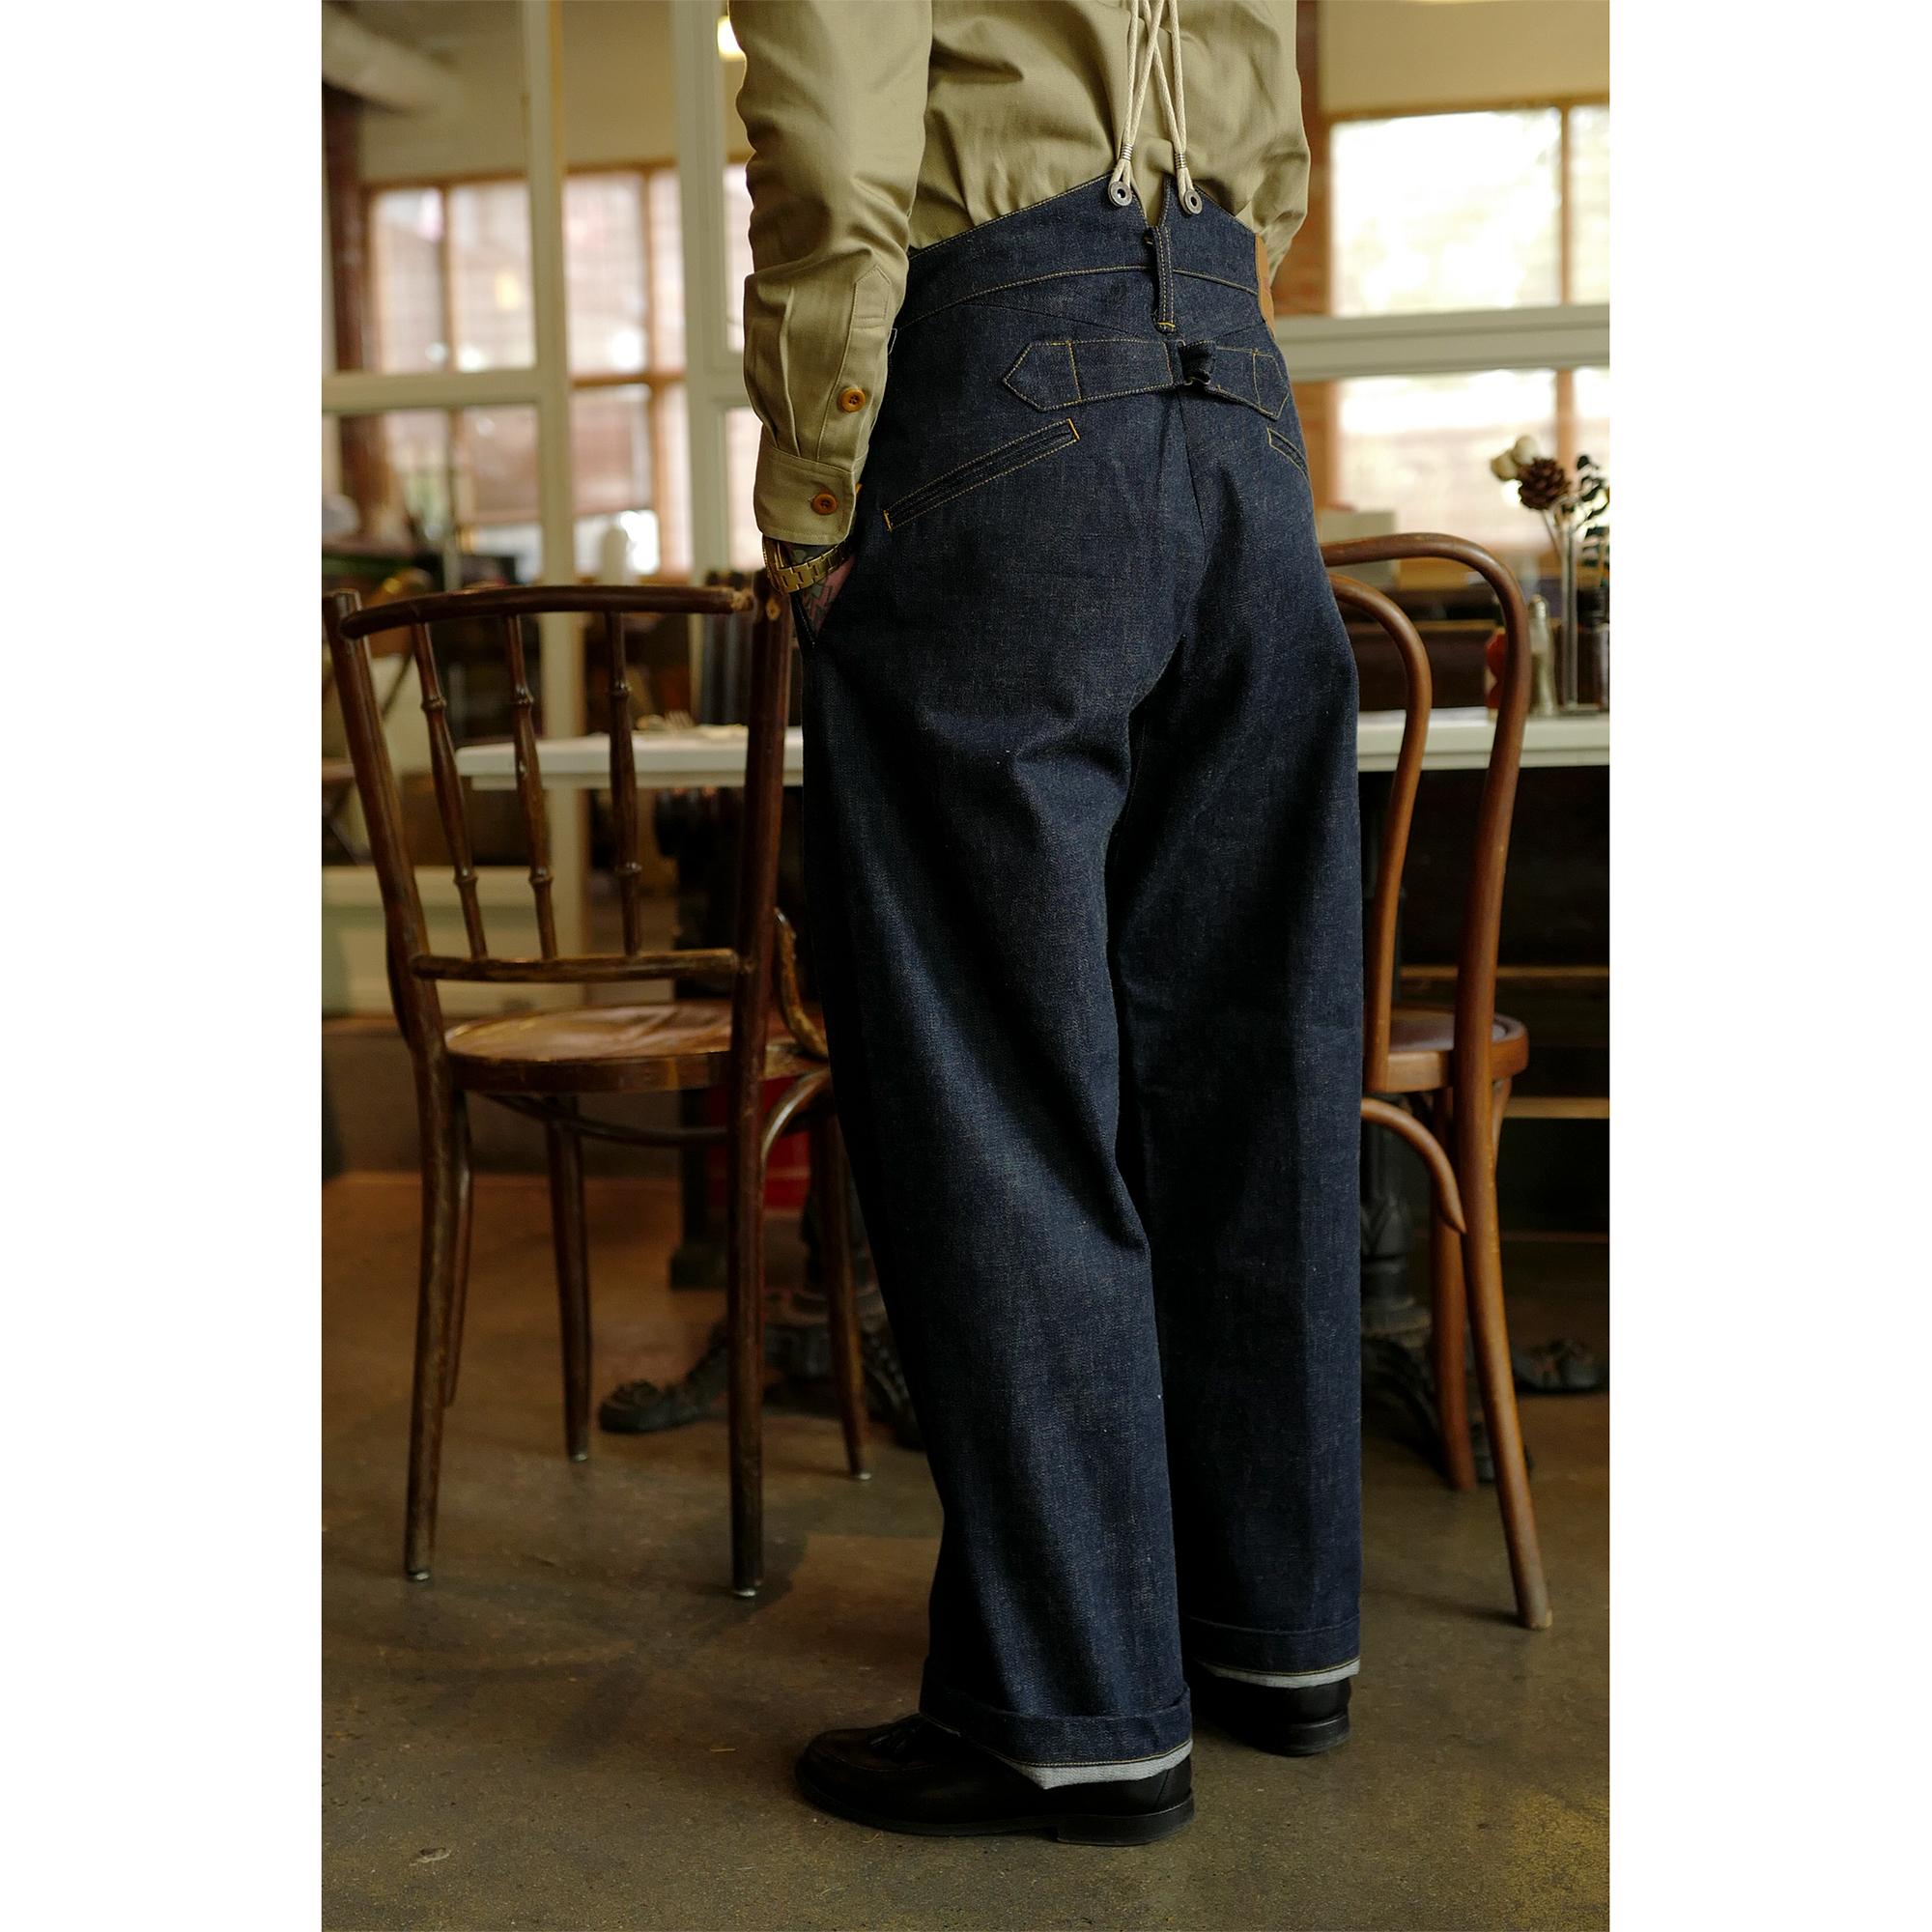 Labour union新版型连腰背带阔腿牛仔裤古着康正1930s LU094